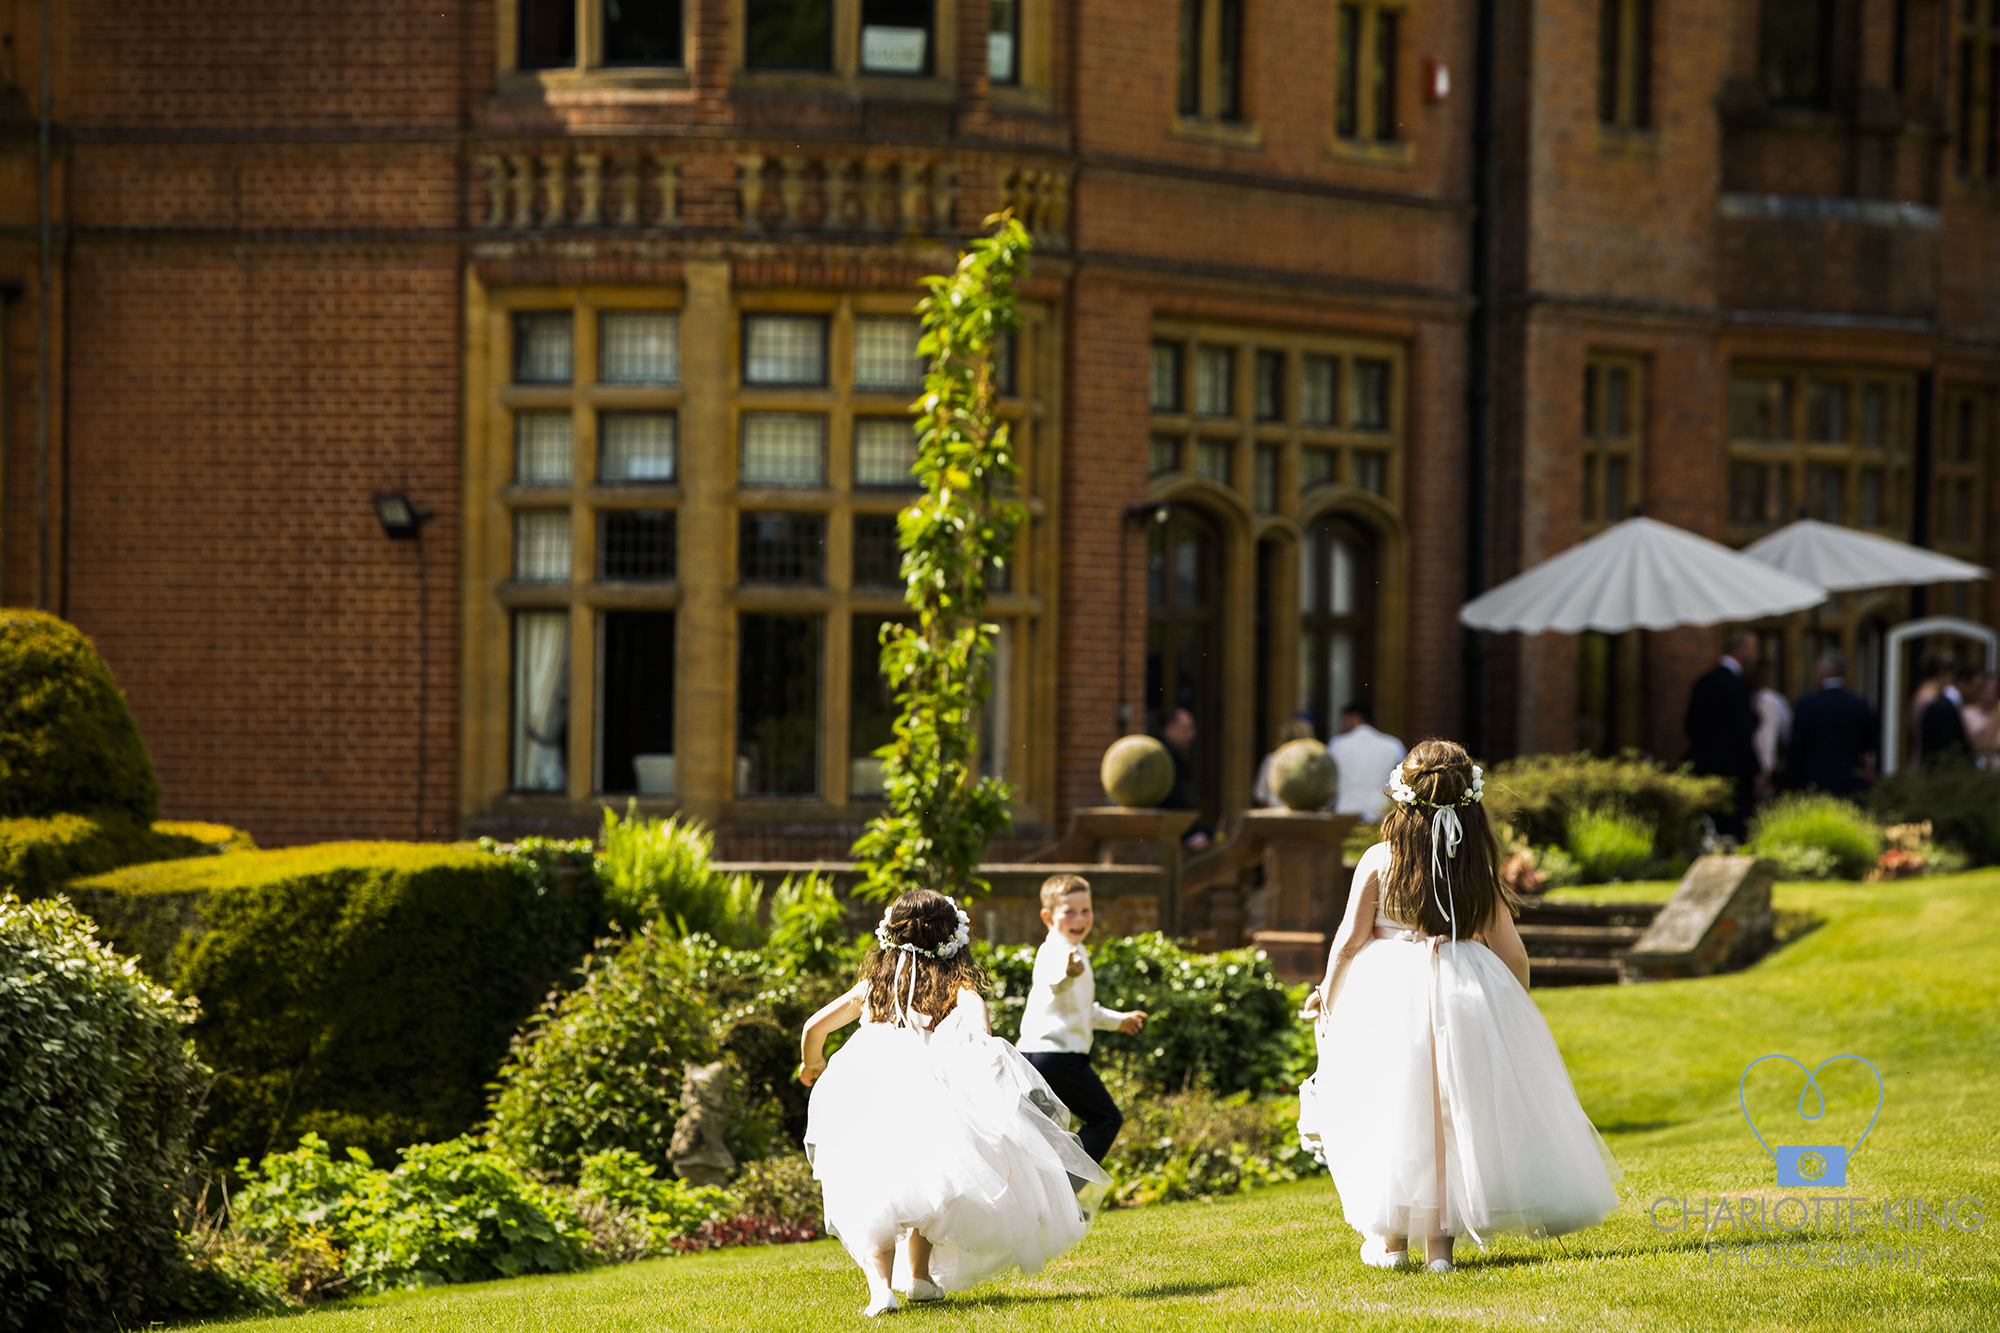 Woldingham-school-wedding-charlotte-king-photography (126)